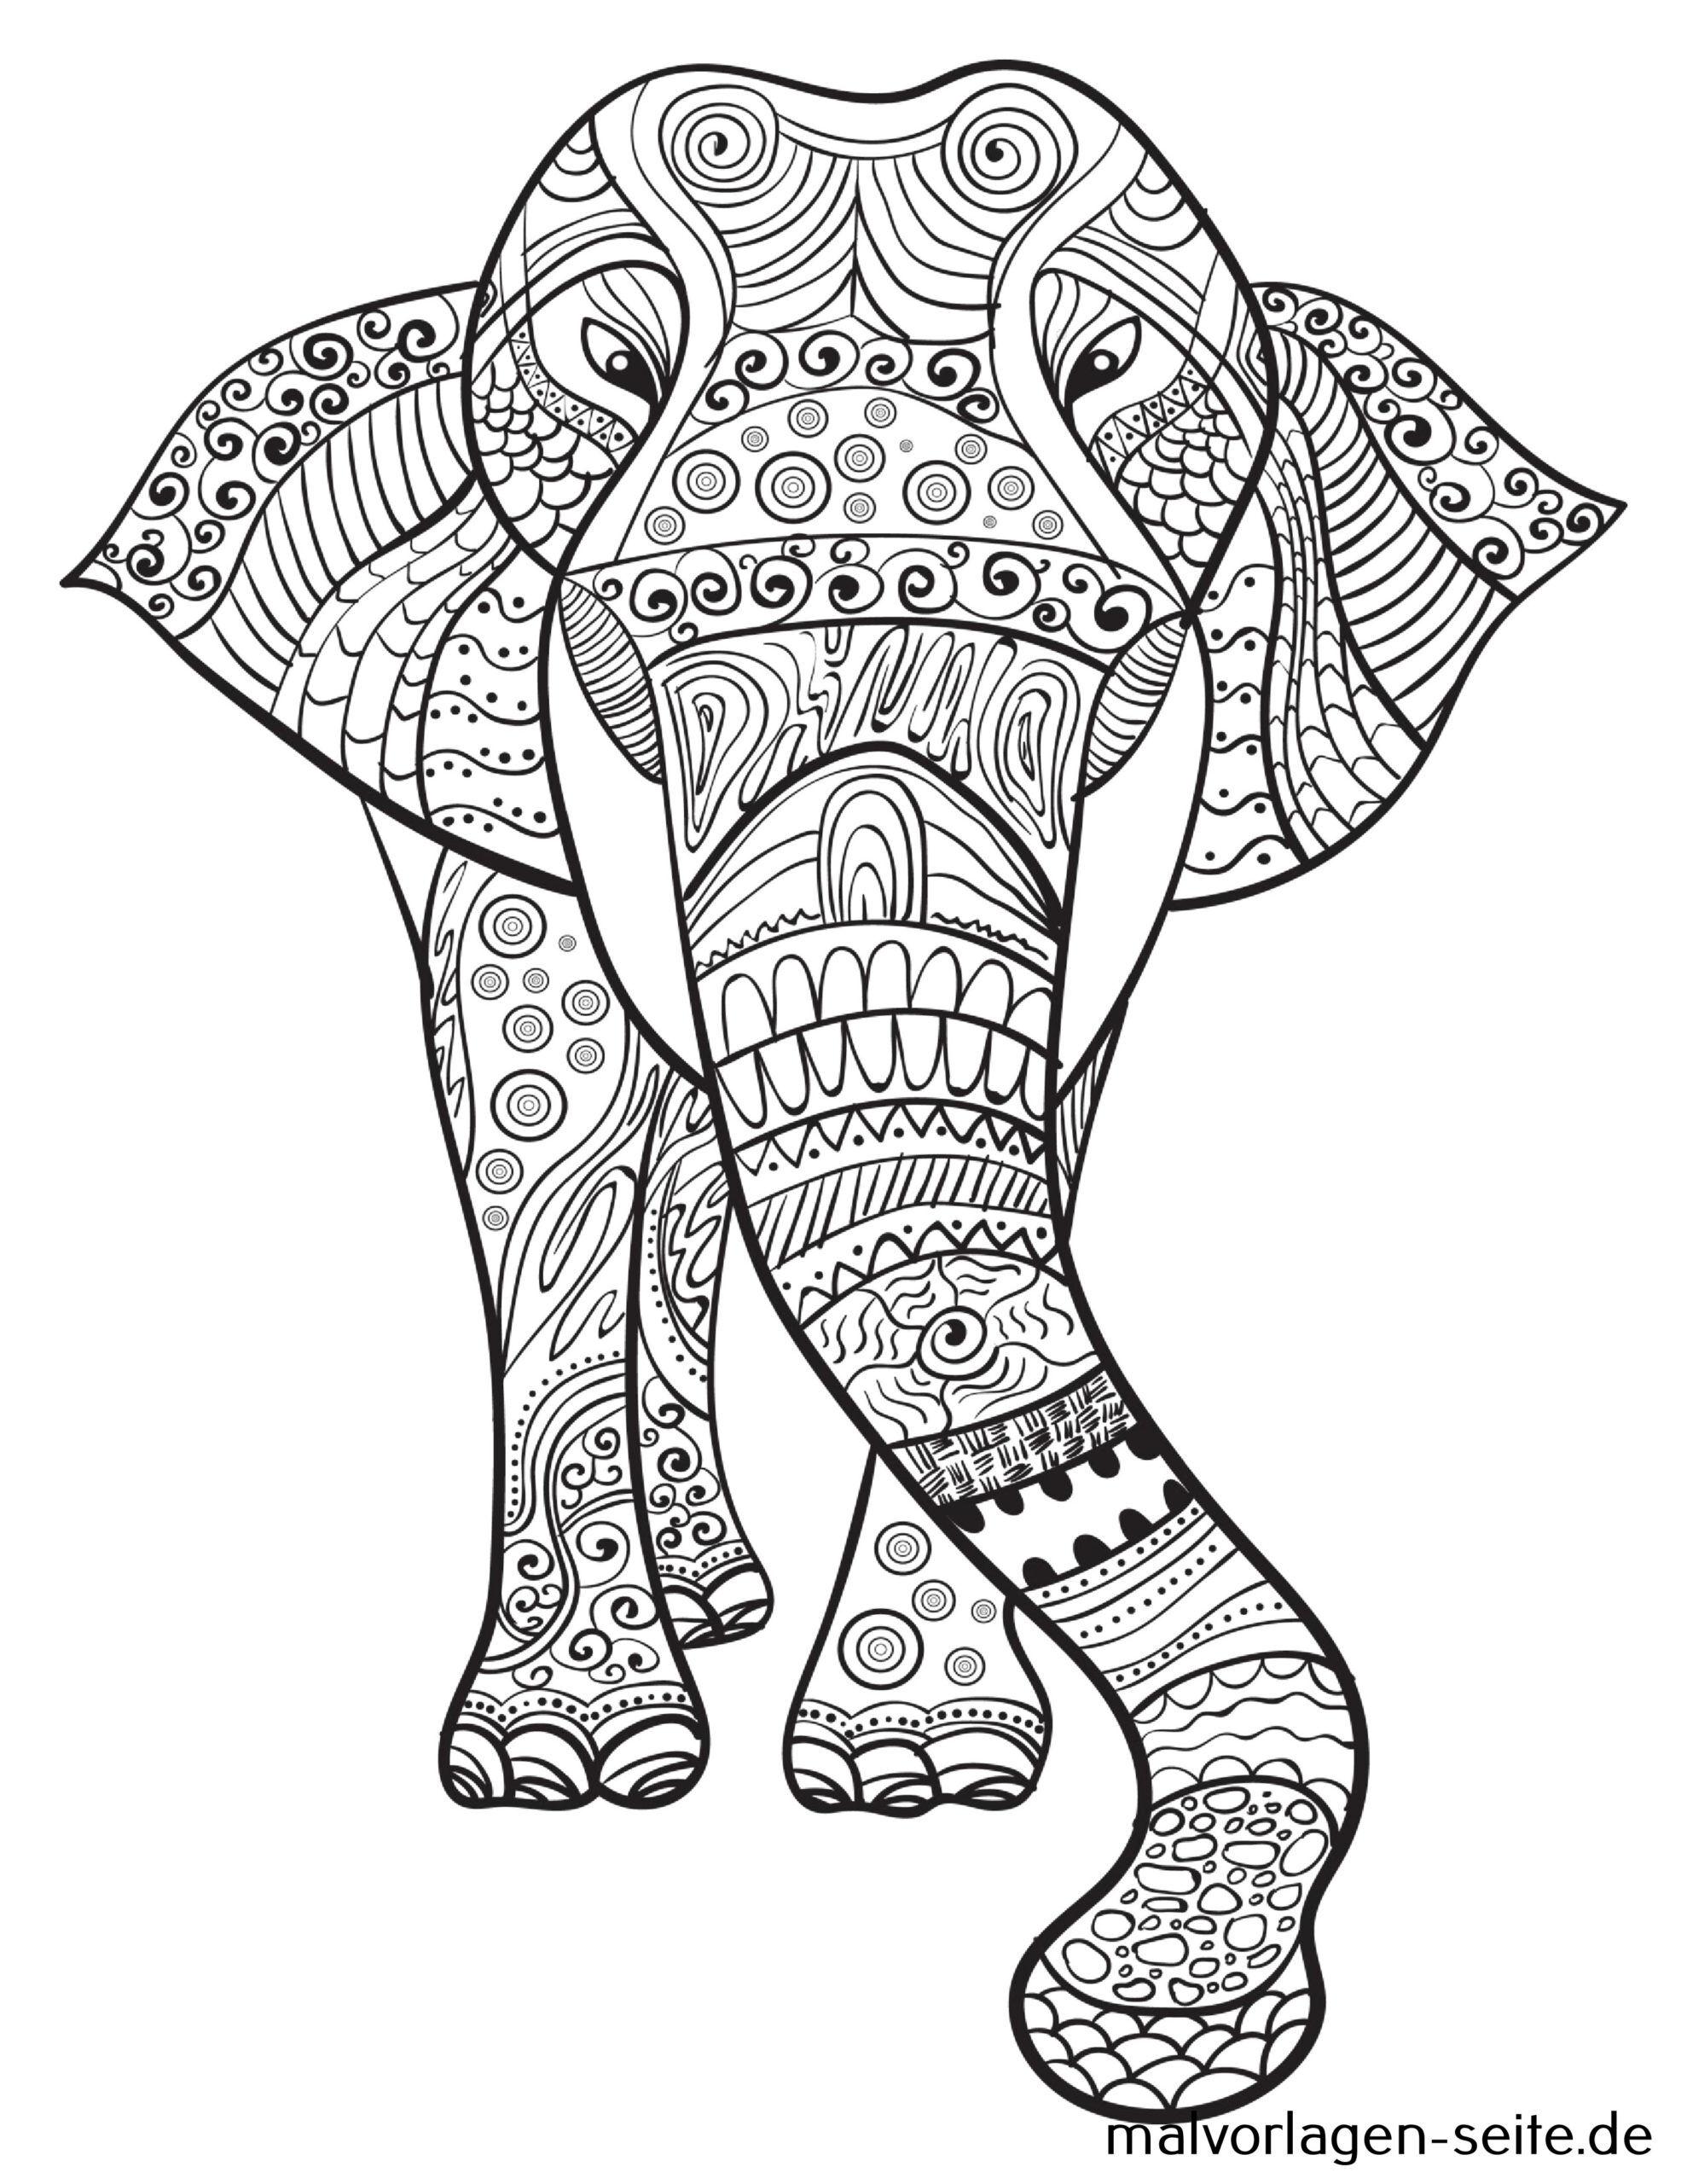 Tolle Mandala Erwachsene - Elefant - Kostenlose Ausmalbilder